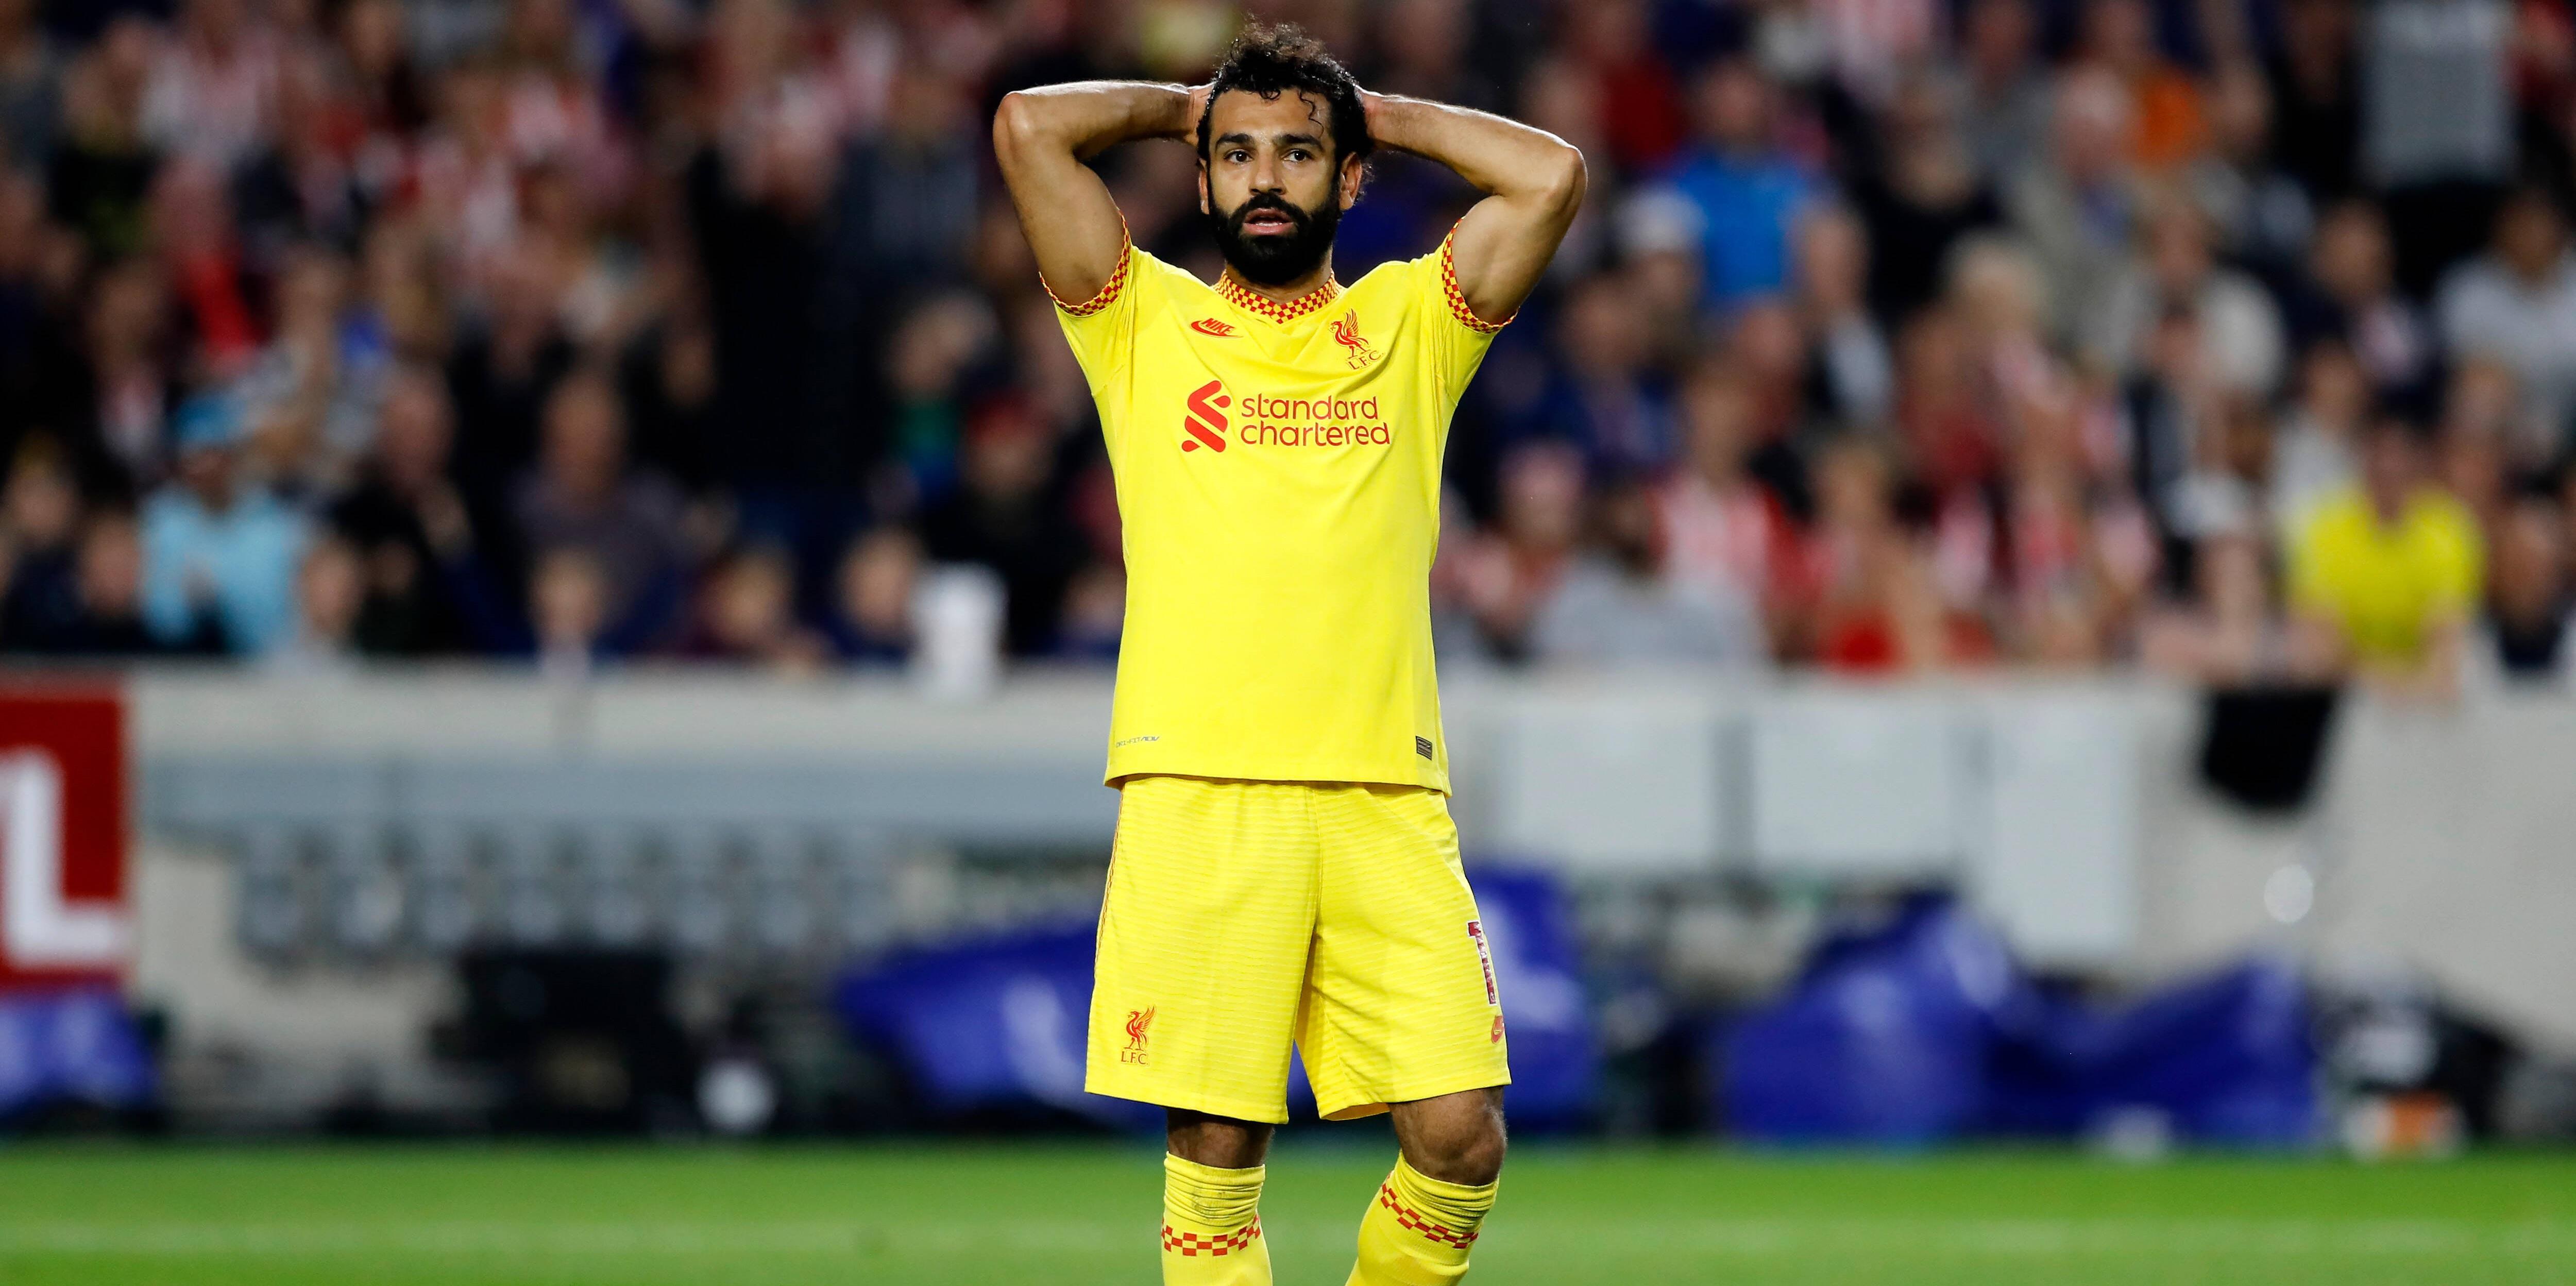 Salah left disappointed despite scoring 100th league goal for Liverpool, says Jurgen Klopp